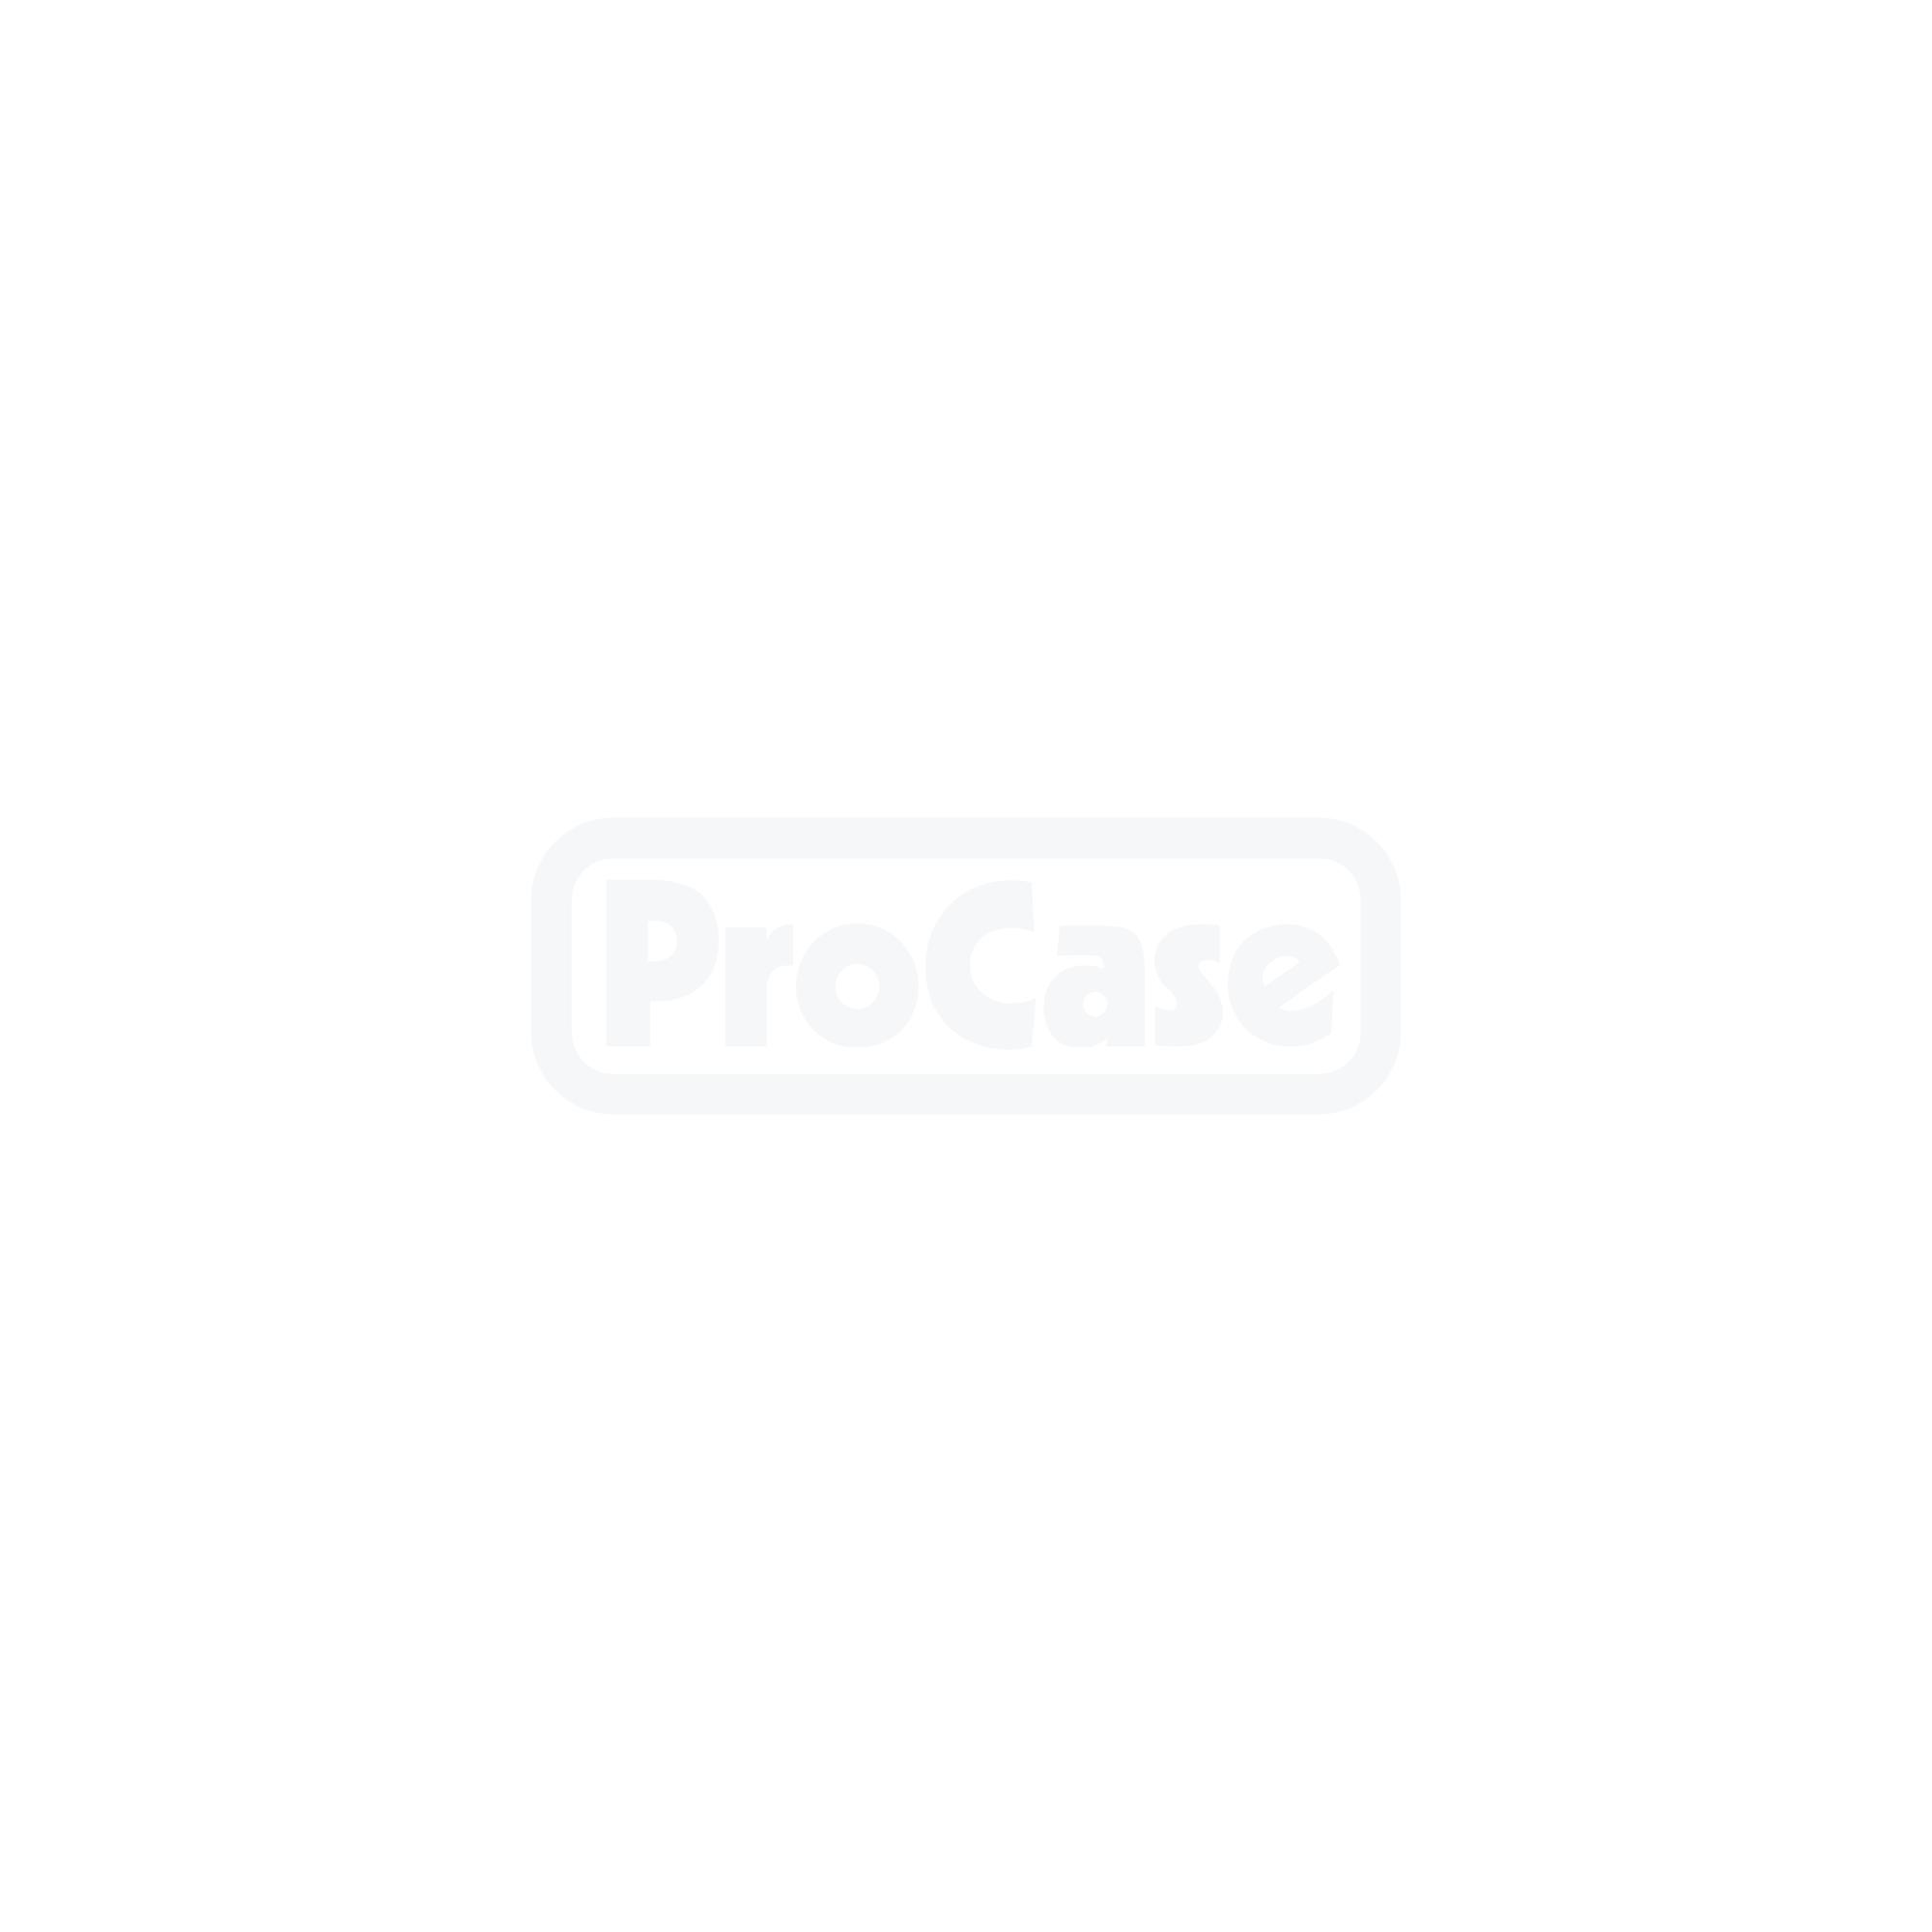 Standard-PackCase für Varytec LED Touch Wash 24x8